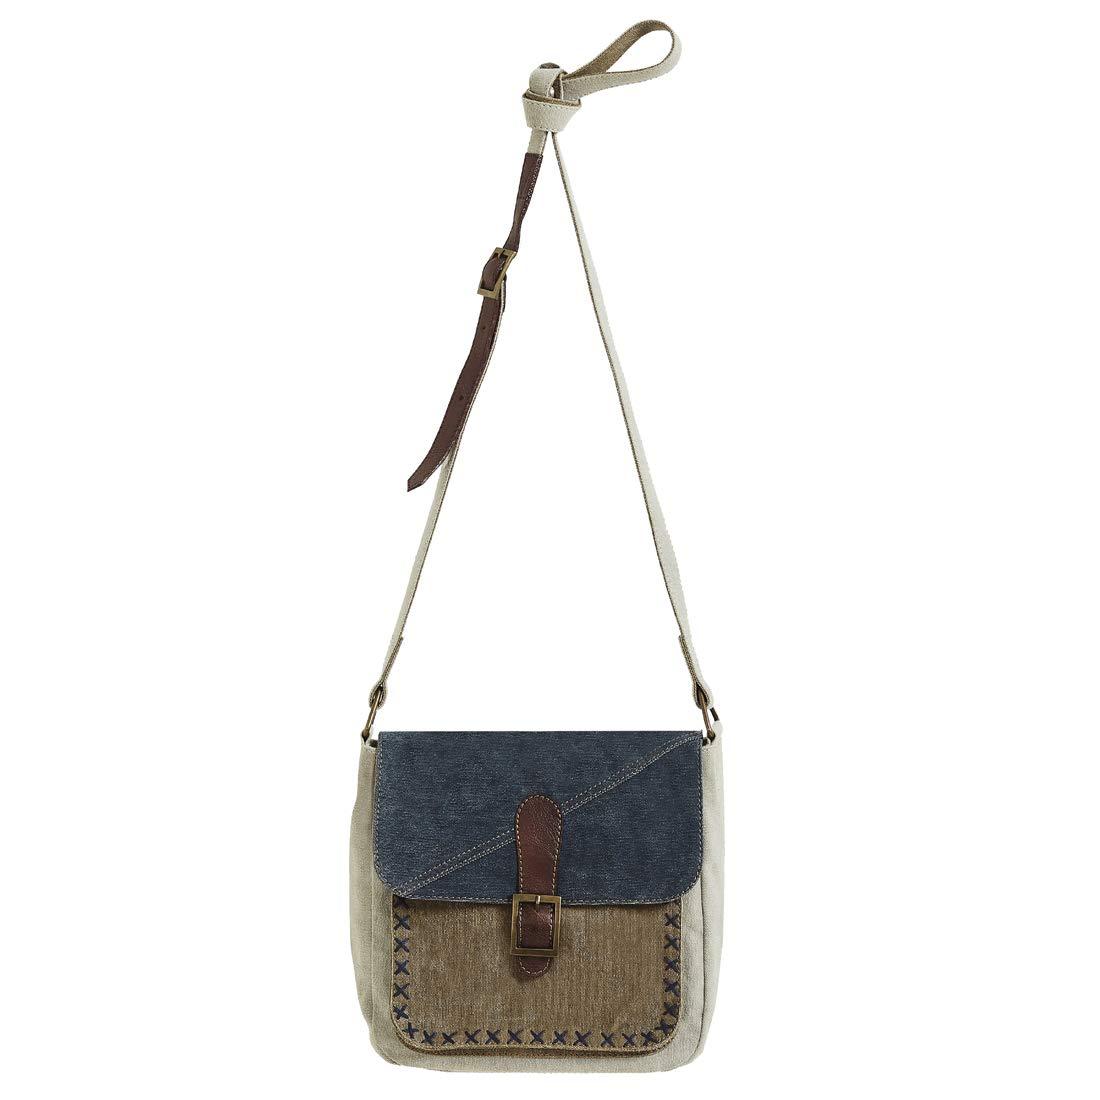 Mona B Purse Women's Upcycled Canvas Luna Crossbody Shoulder Bag